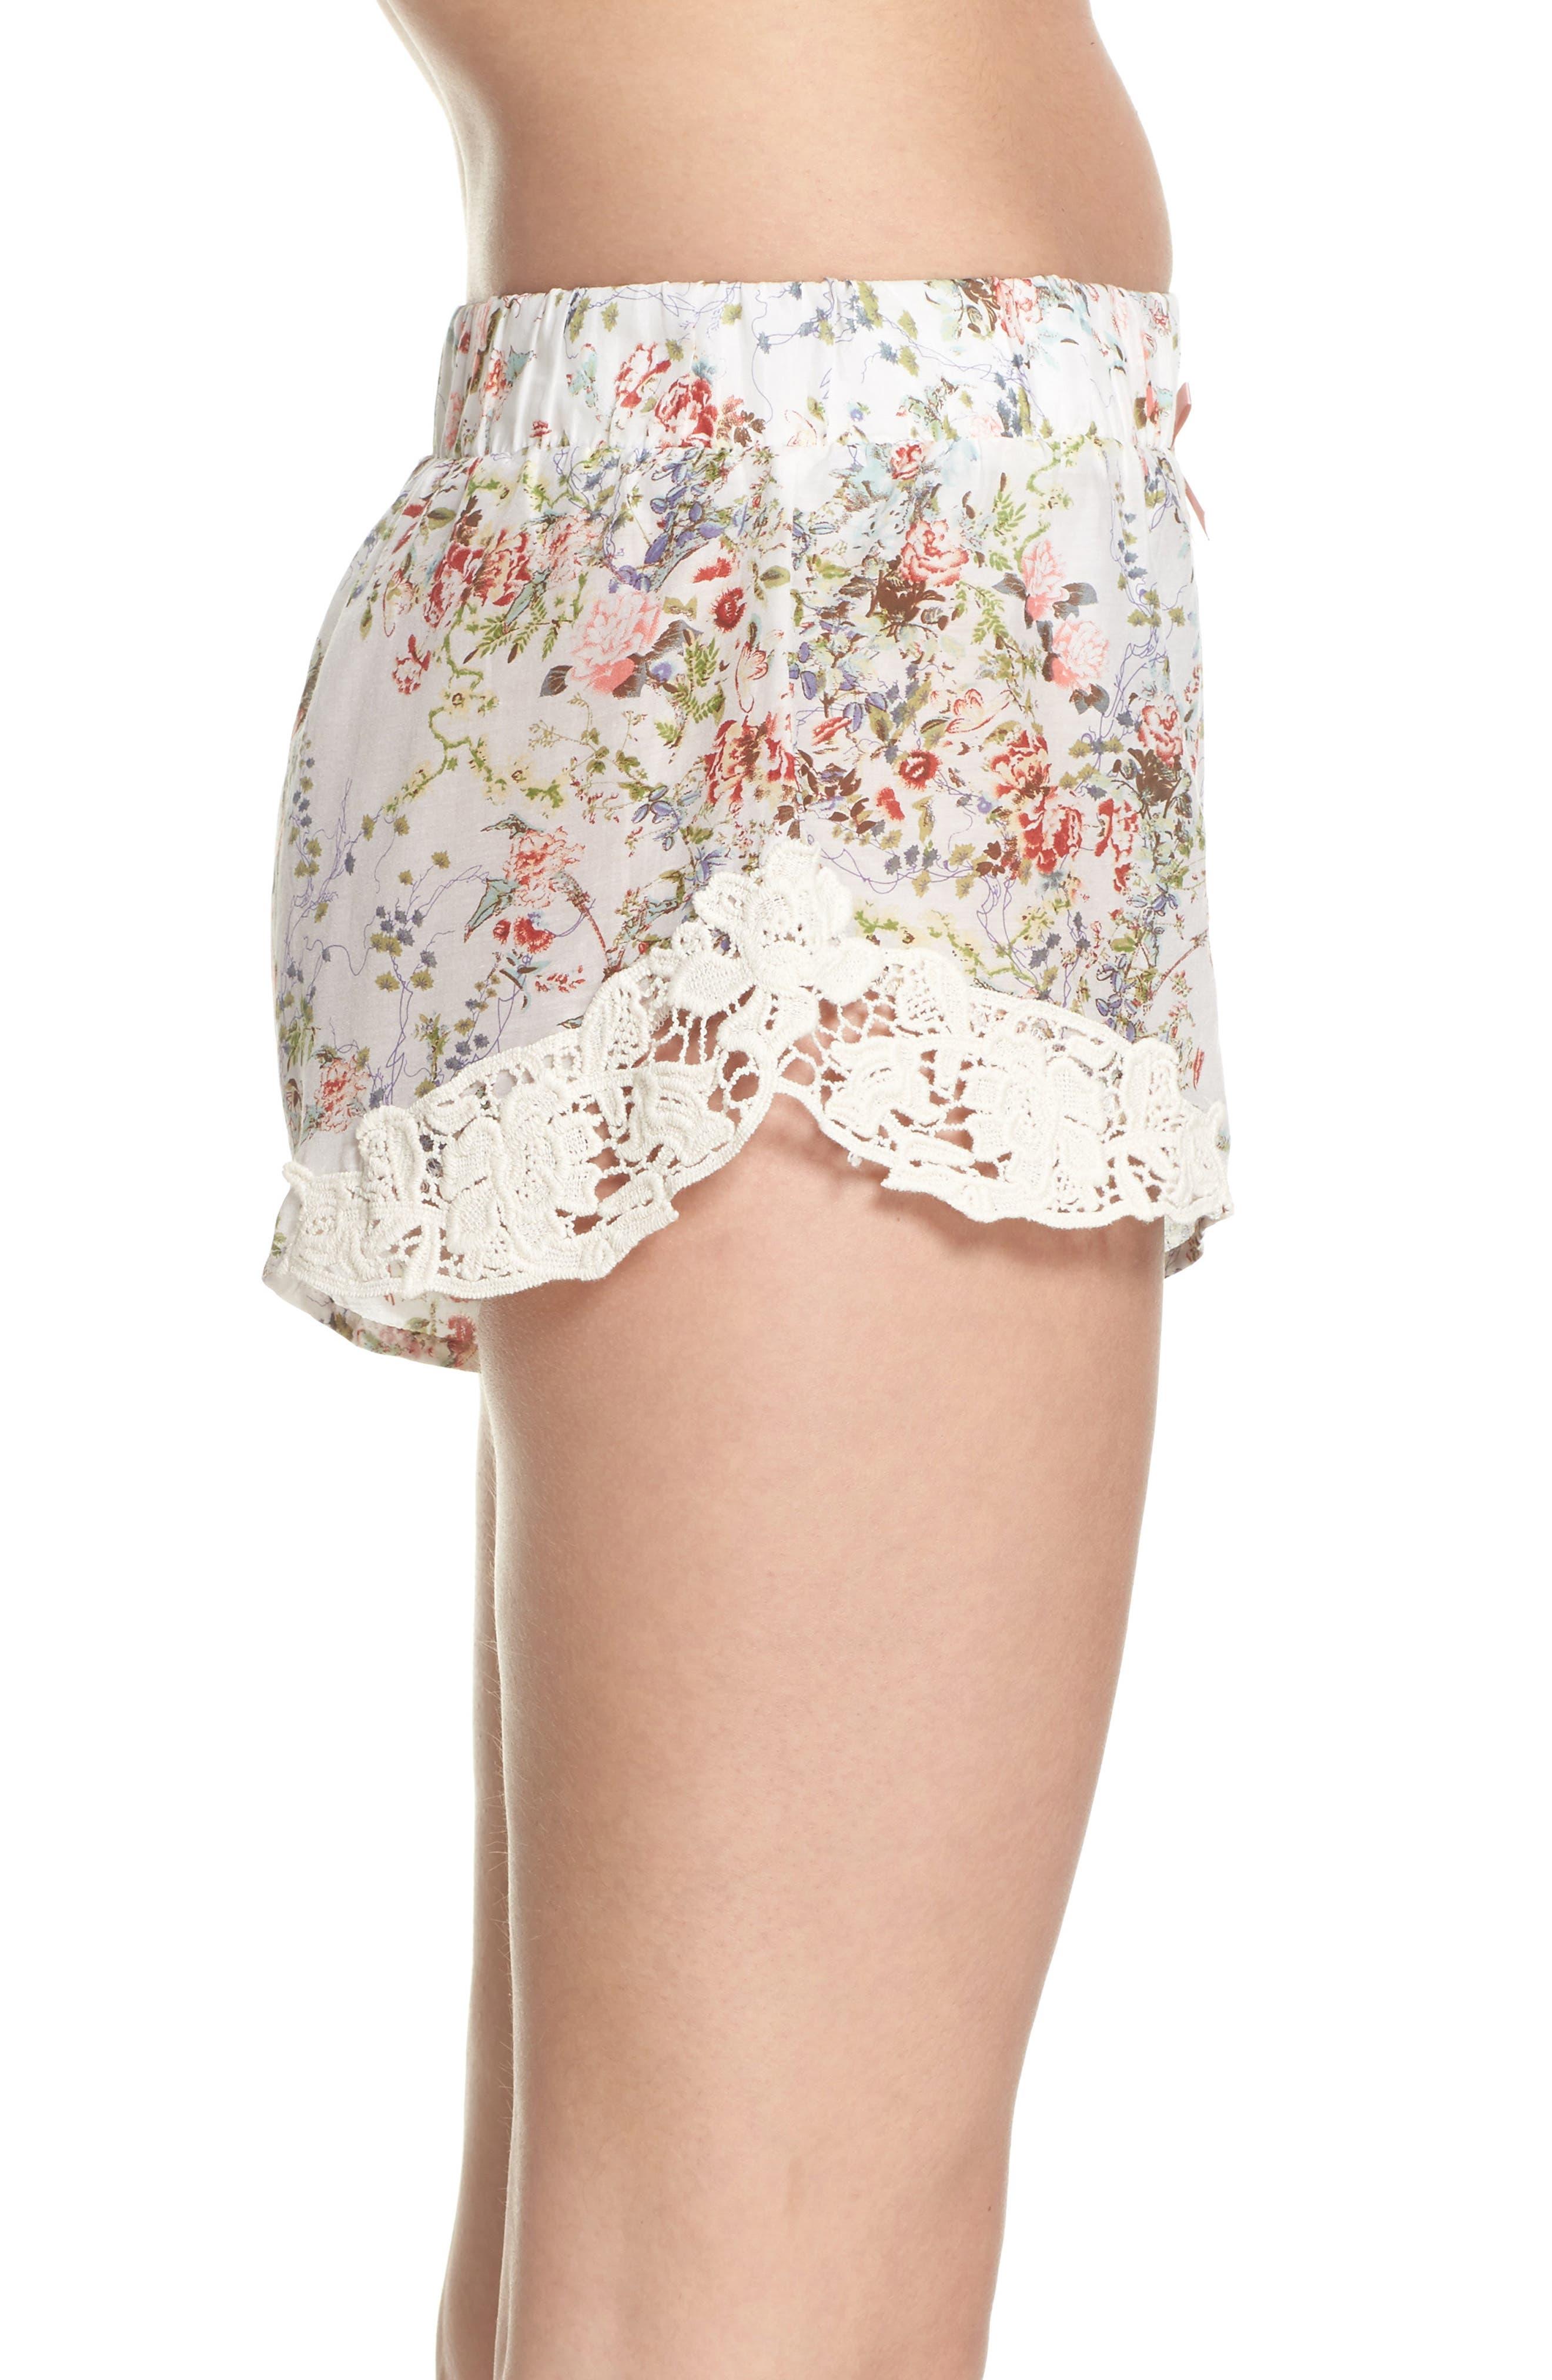 Yolly Floral Pajama Shorts,                             Alternate thumbnail 3, color,                             IVORY FLORAL